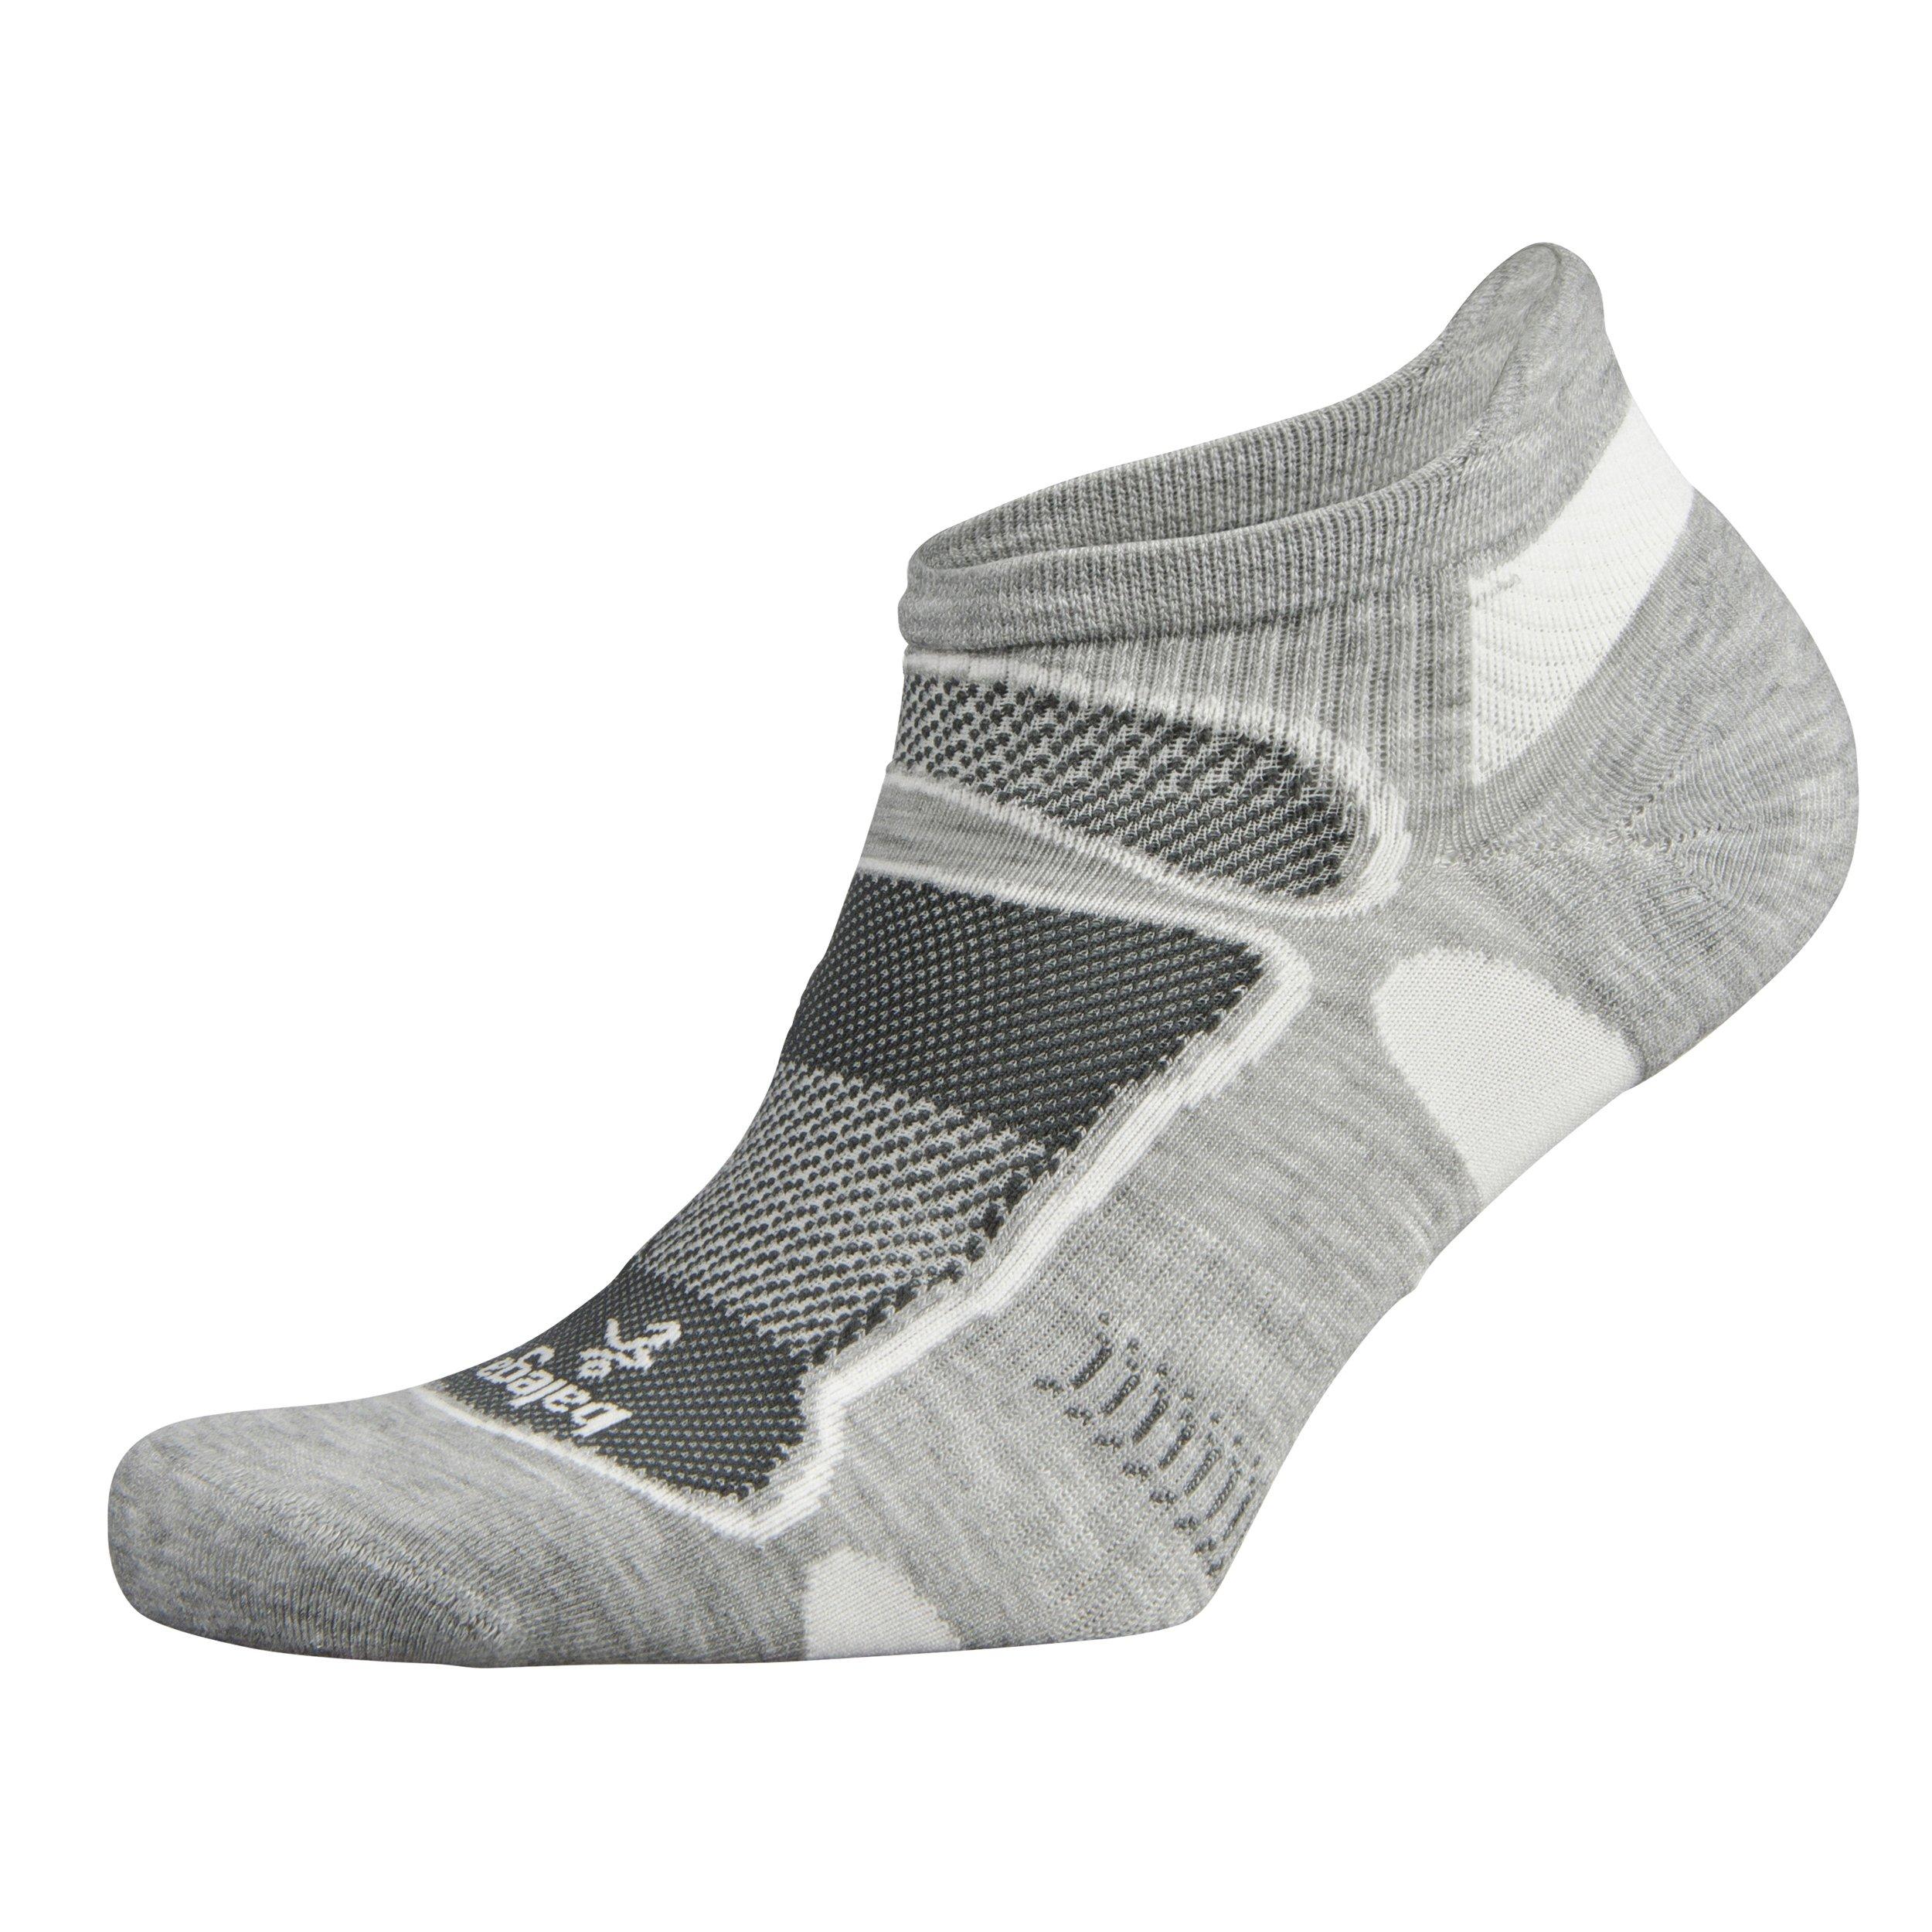 Balega Ultralight No Show Athletic Running Socks for Men and Women (1 Pair), Grey/White, X-Large